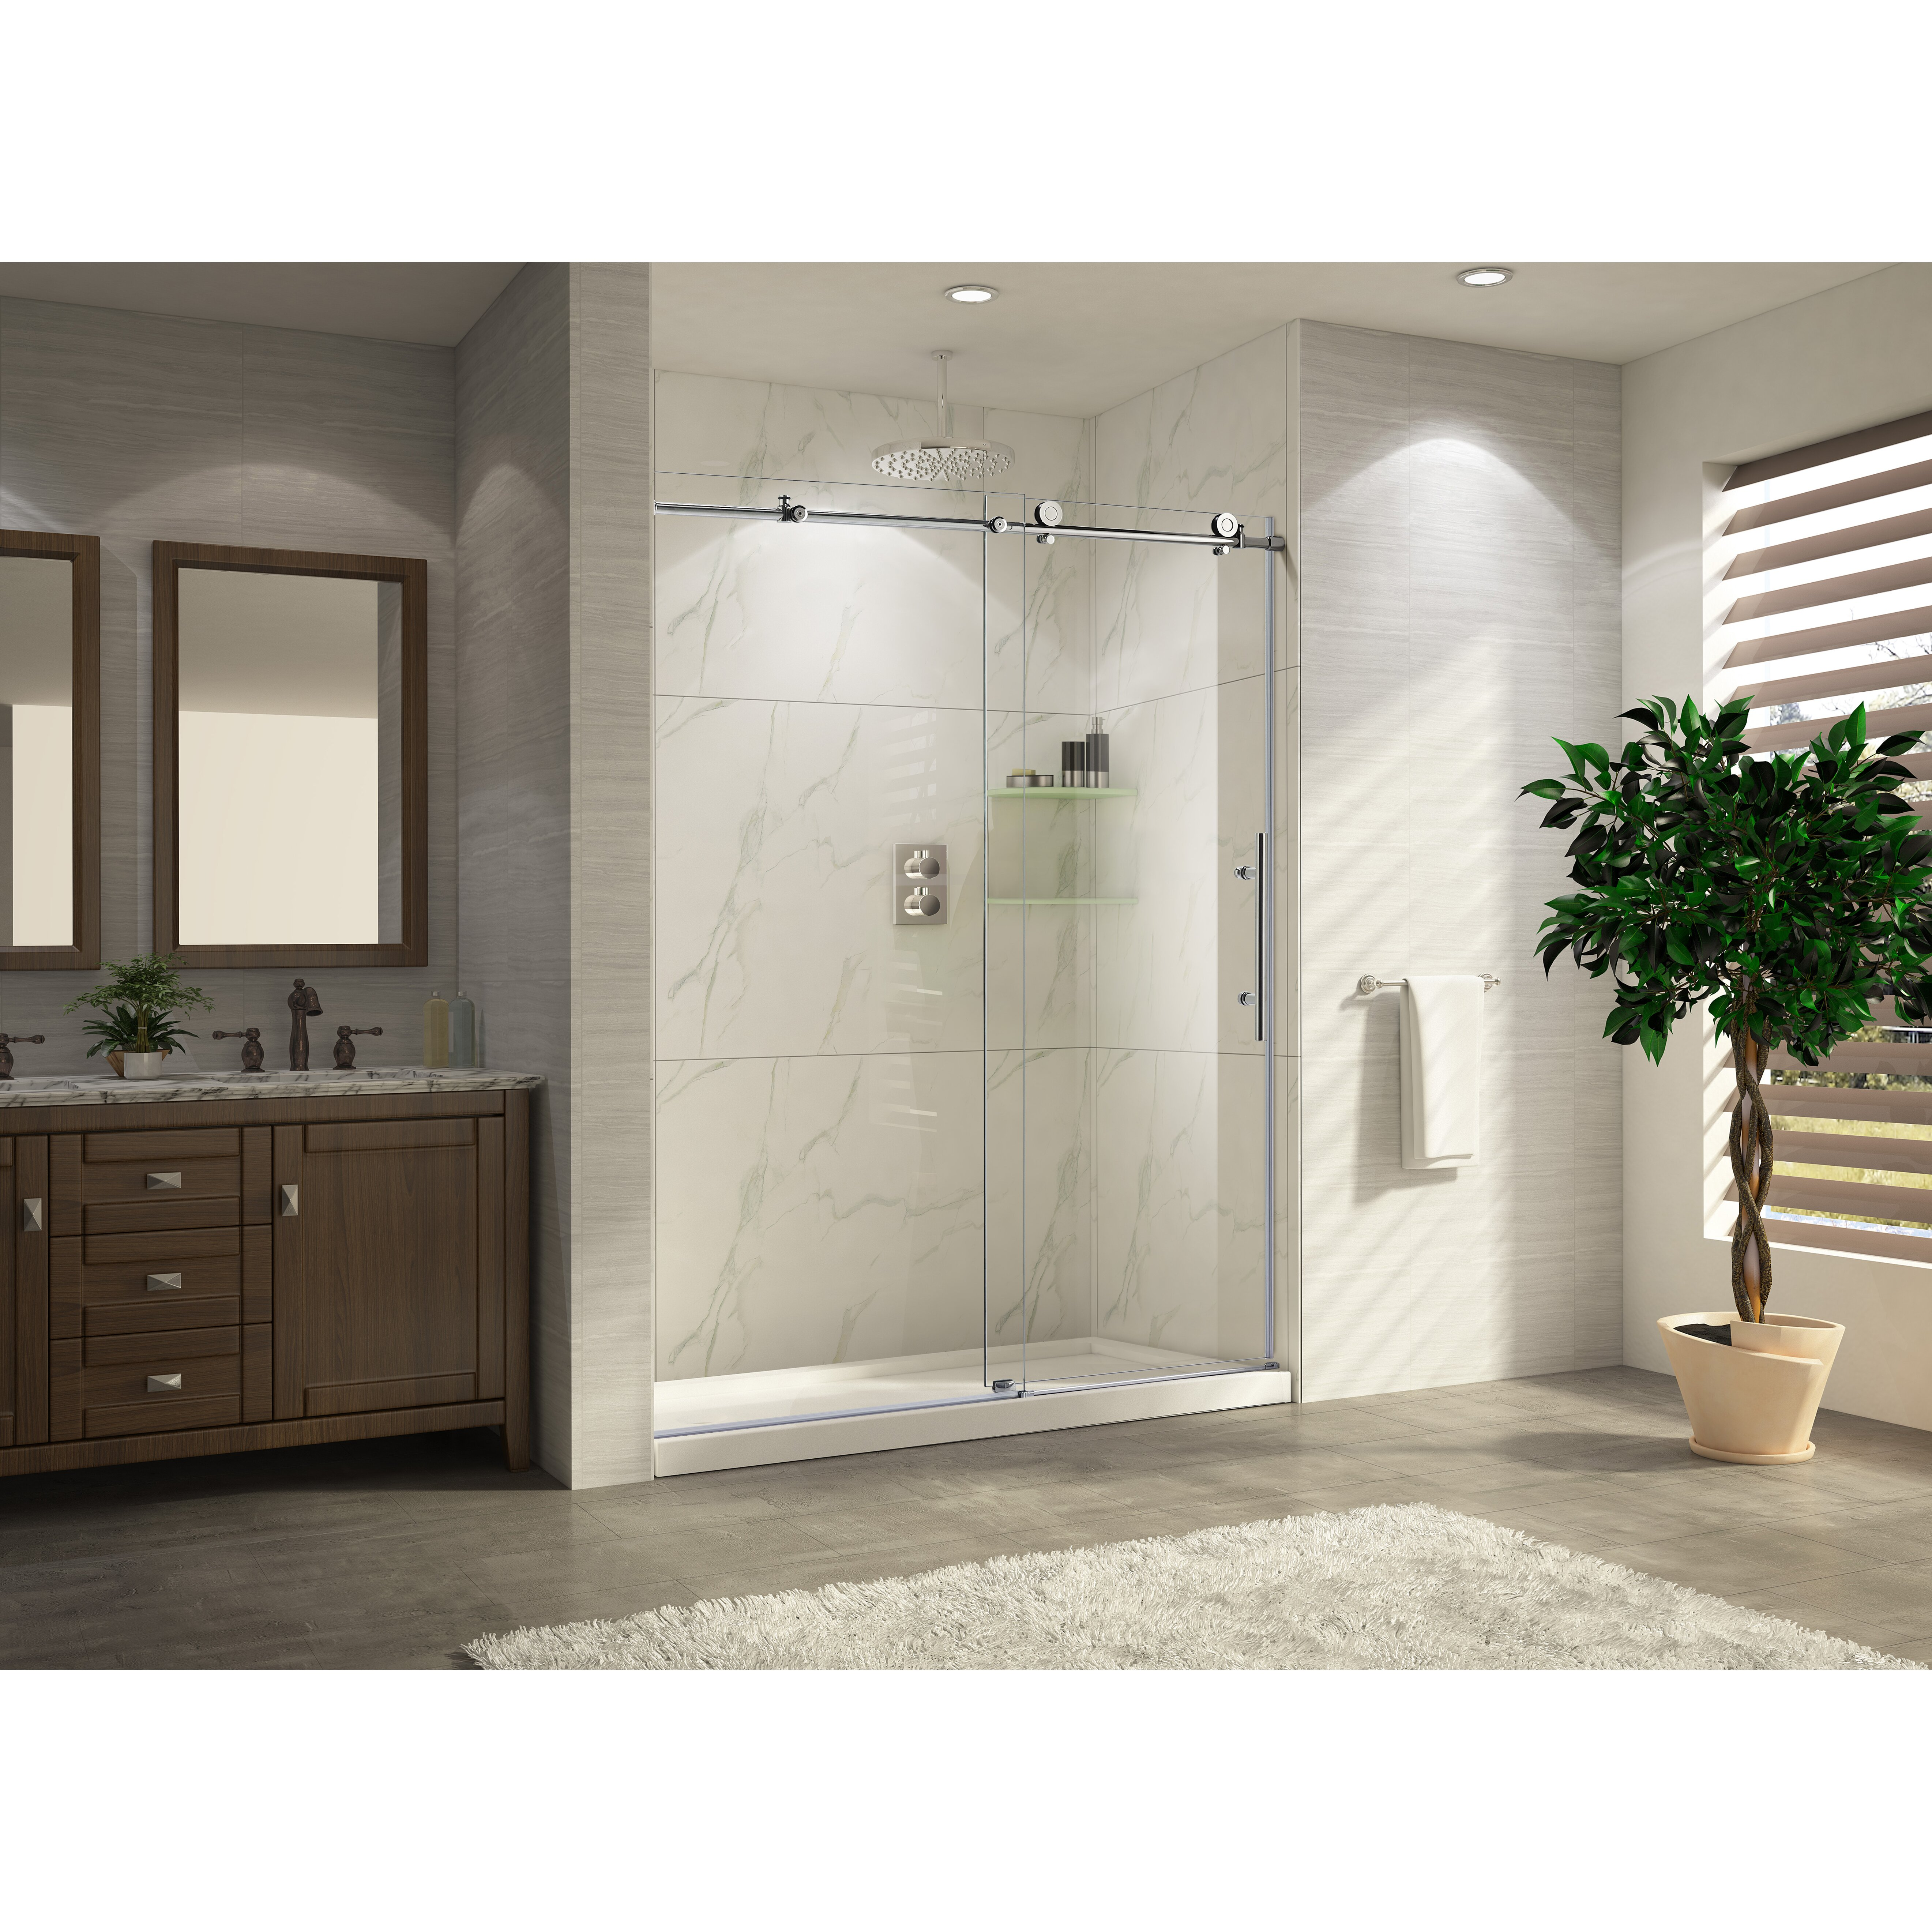 Wet Republic Trident Lux 60 39 39 X 76 39 39 Single Sliding Shower Door Wayfair